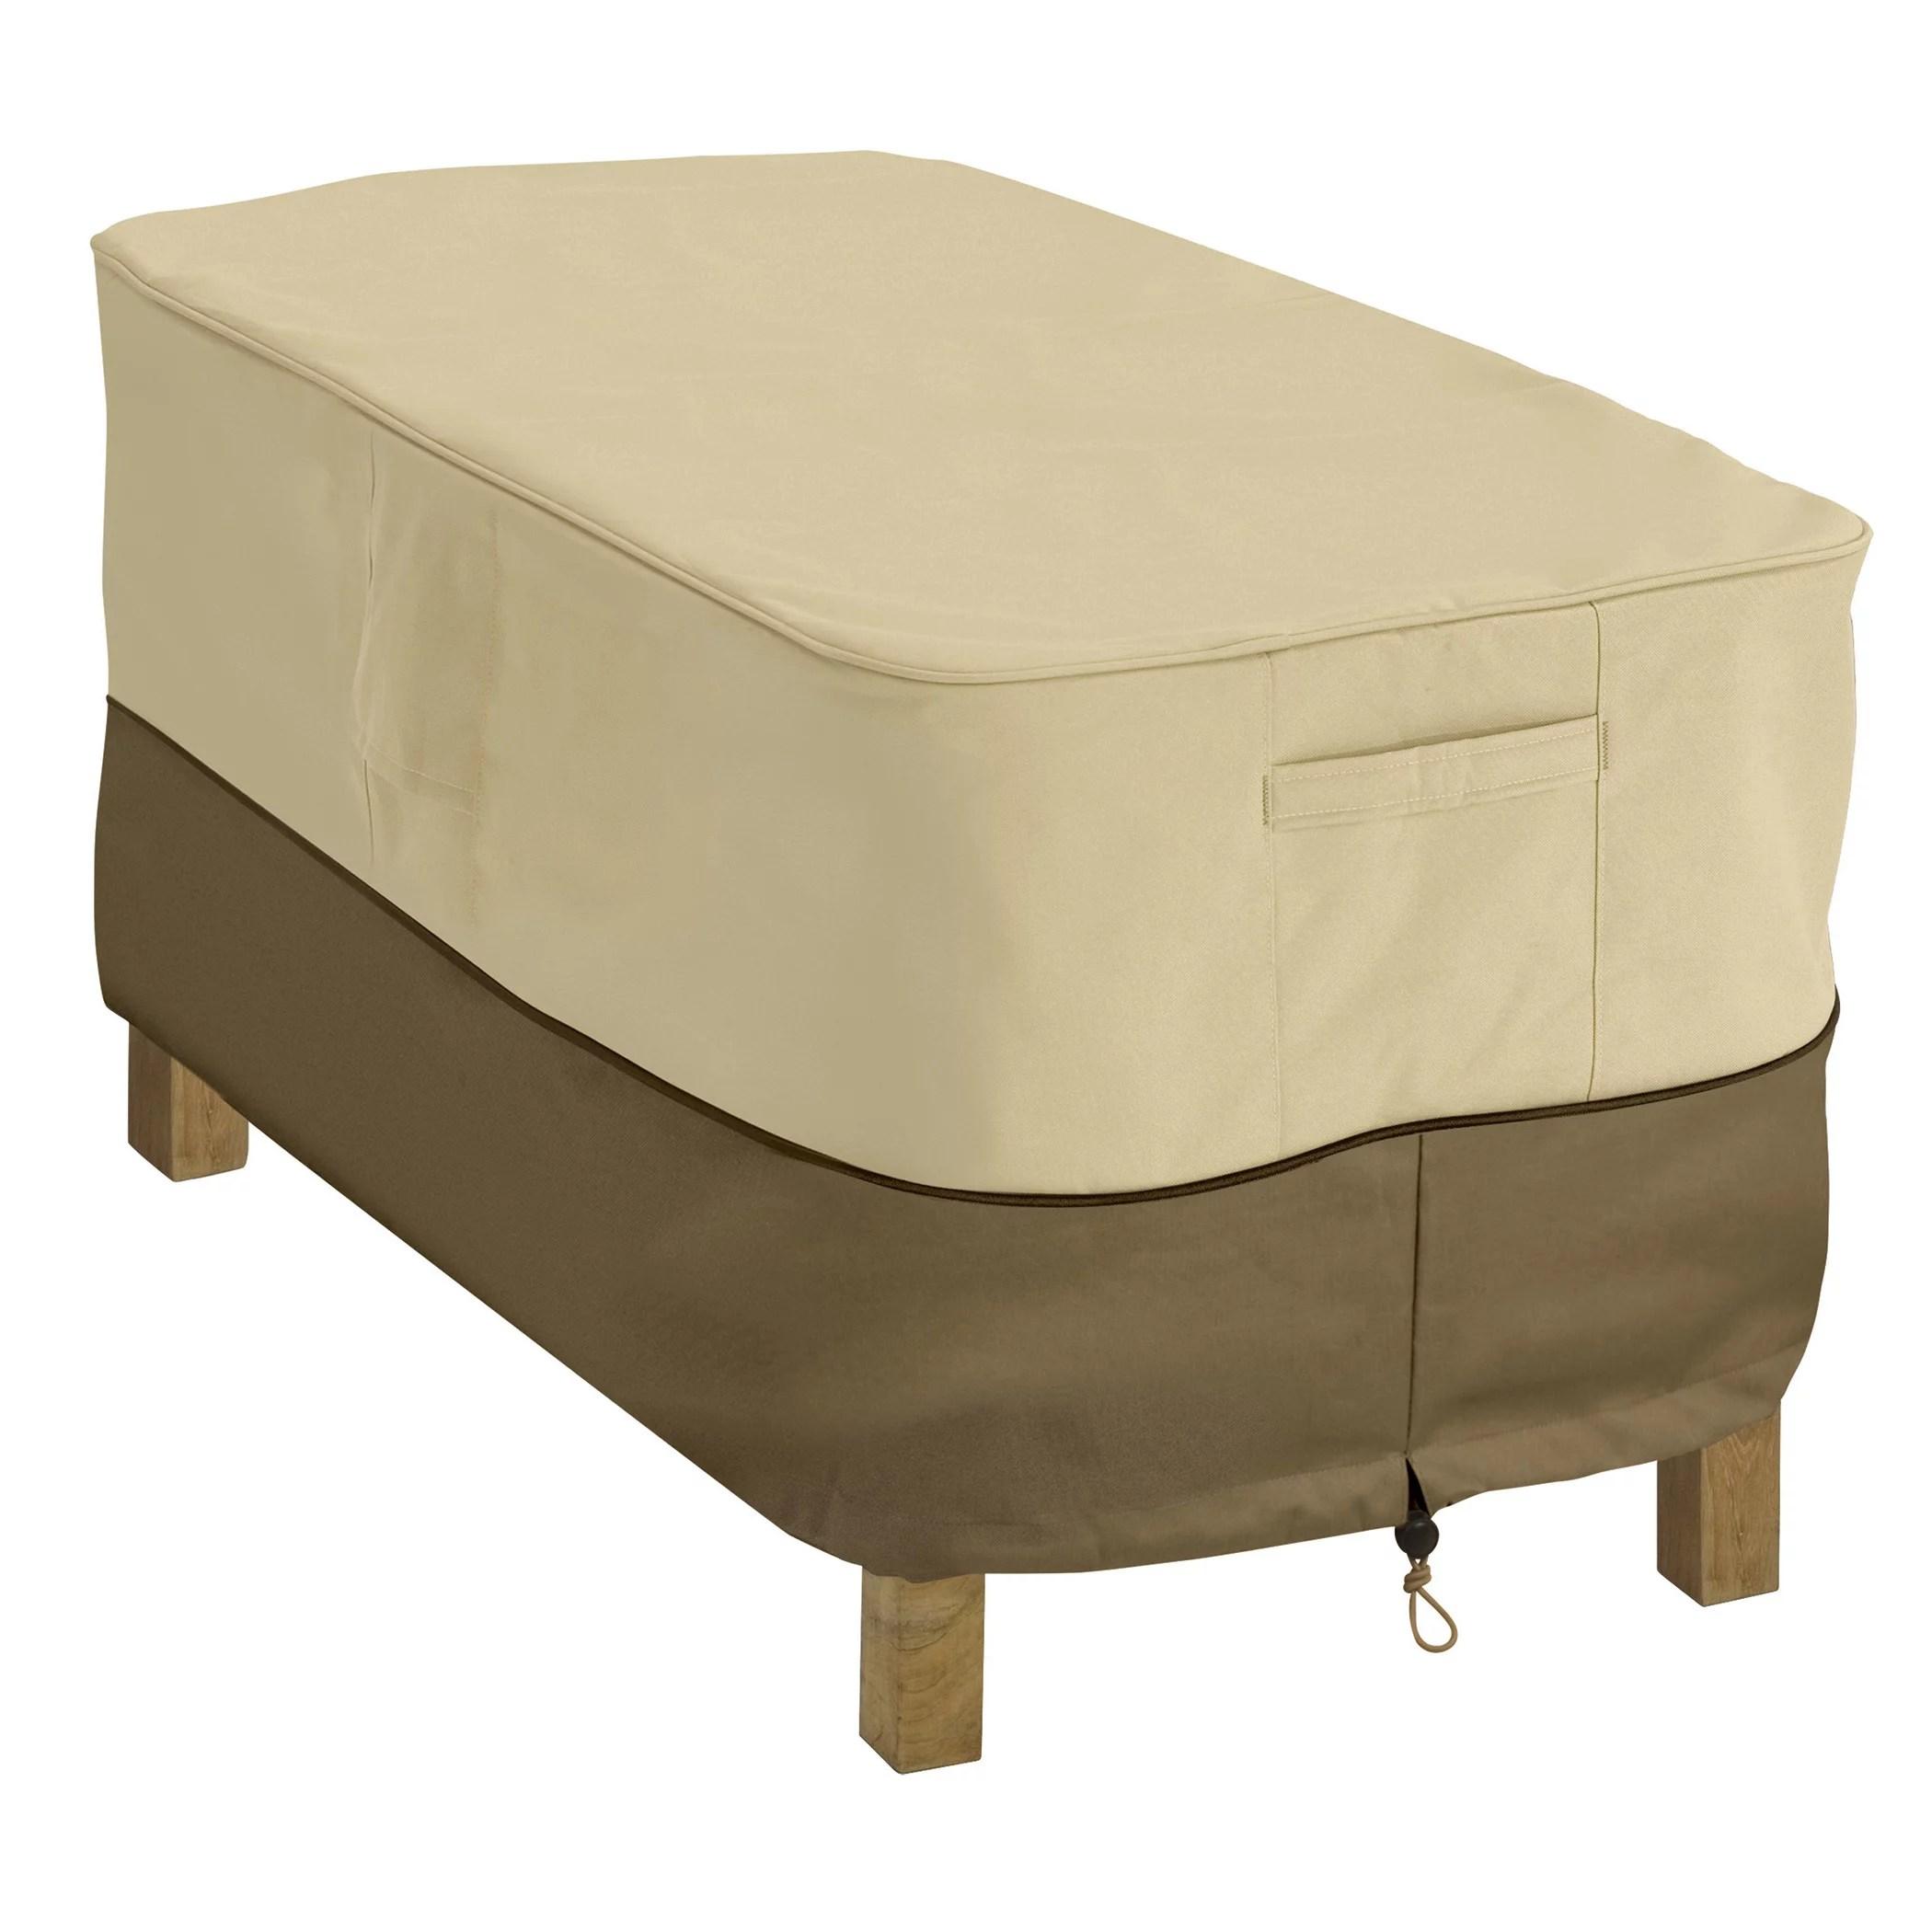 patio table covers walmart com